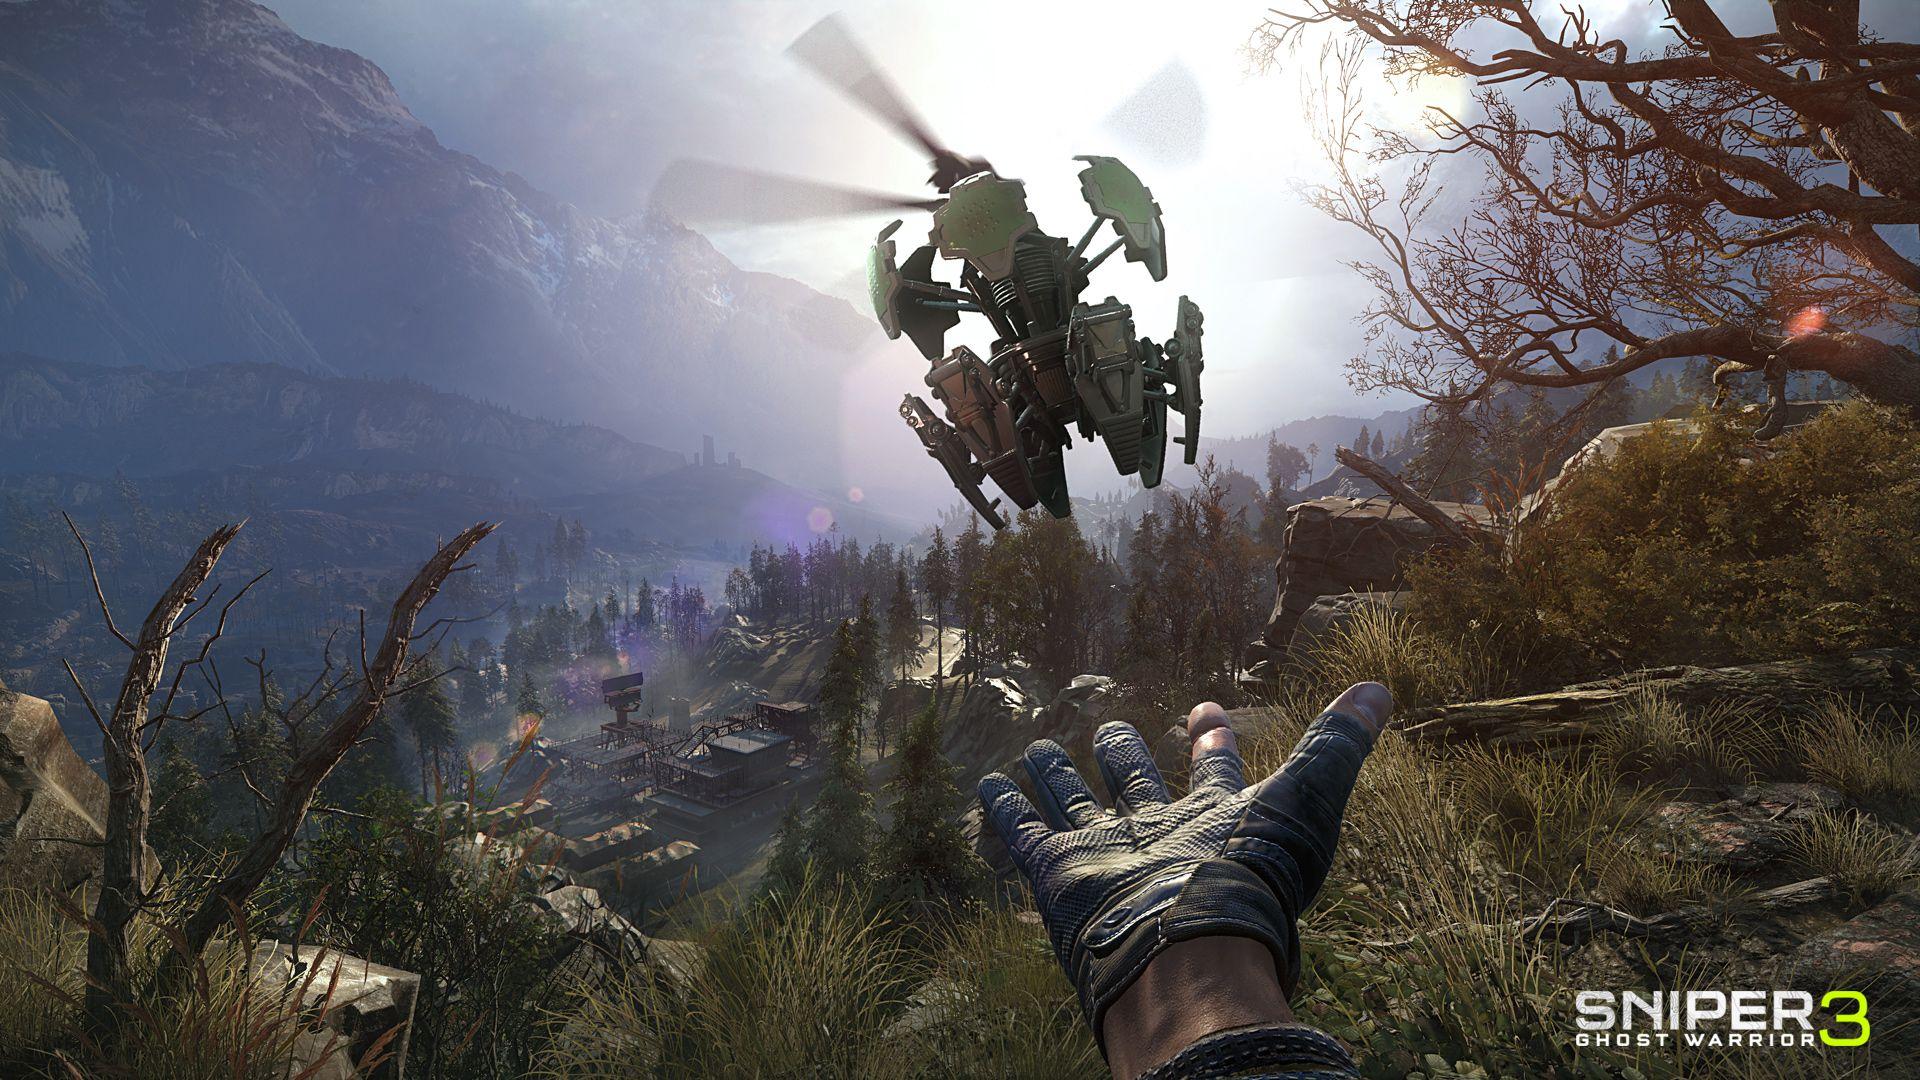 KHAiHOM.com - Sniper Ghost Warrior 3 - All-terrain vehicle